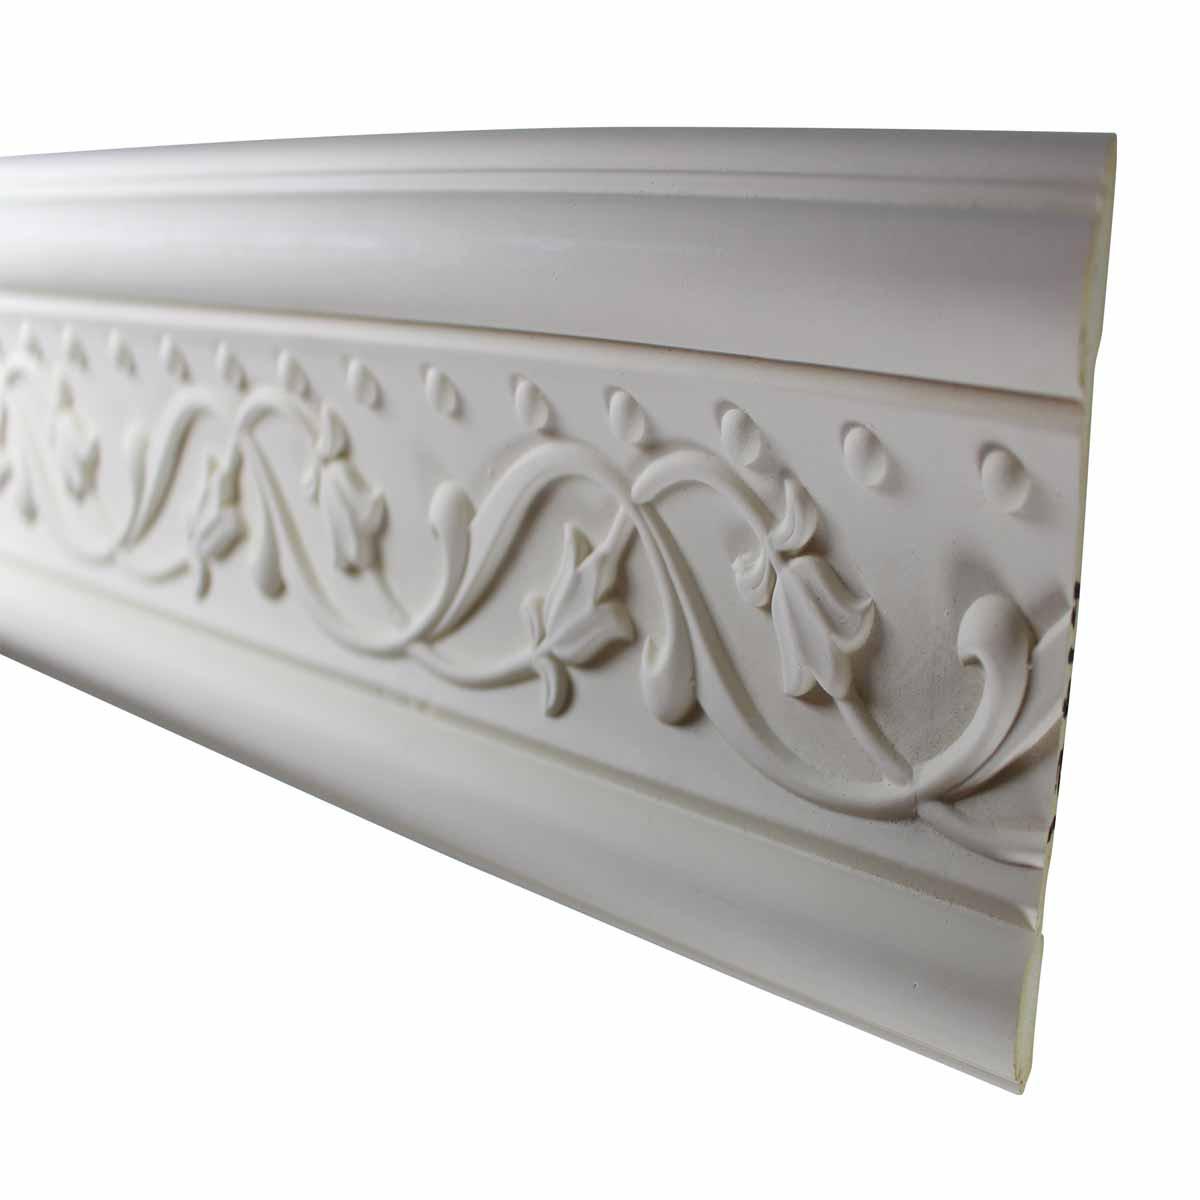 Cornice White Urethane Sample of 11600 24 Long Cornice Cornice Moulding Cornice Molding